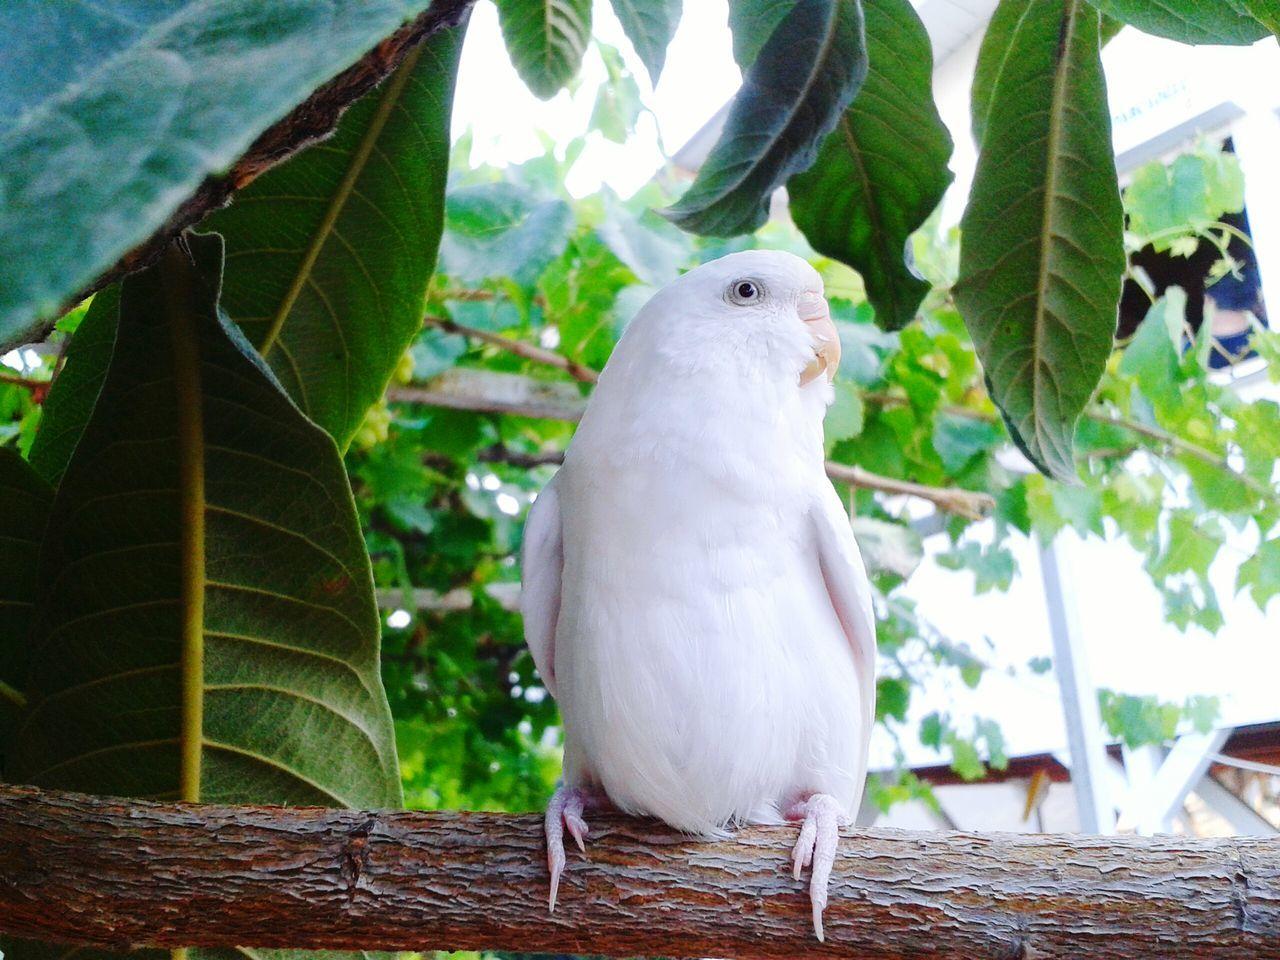 Smart girl Taking Photos Bird Photography White EyeEm Nature Lover Birds_collection